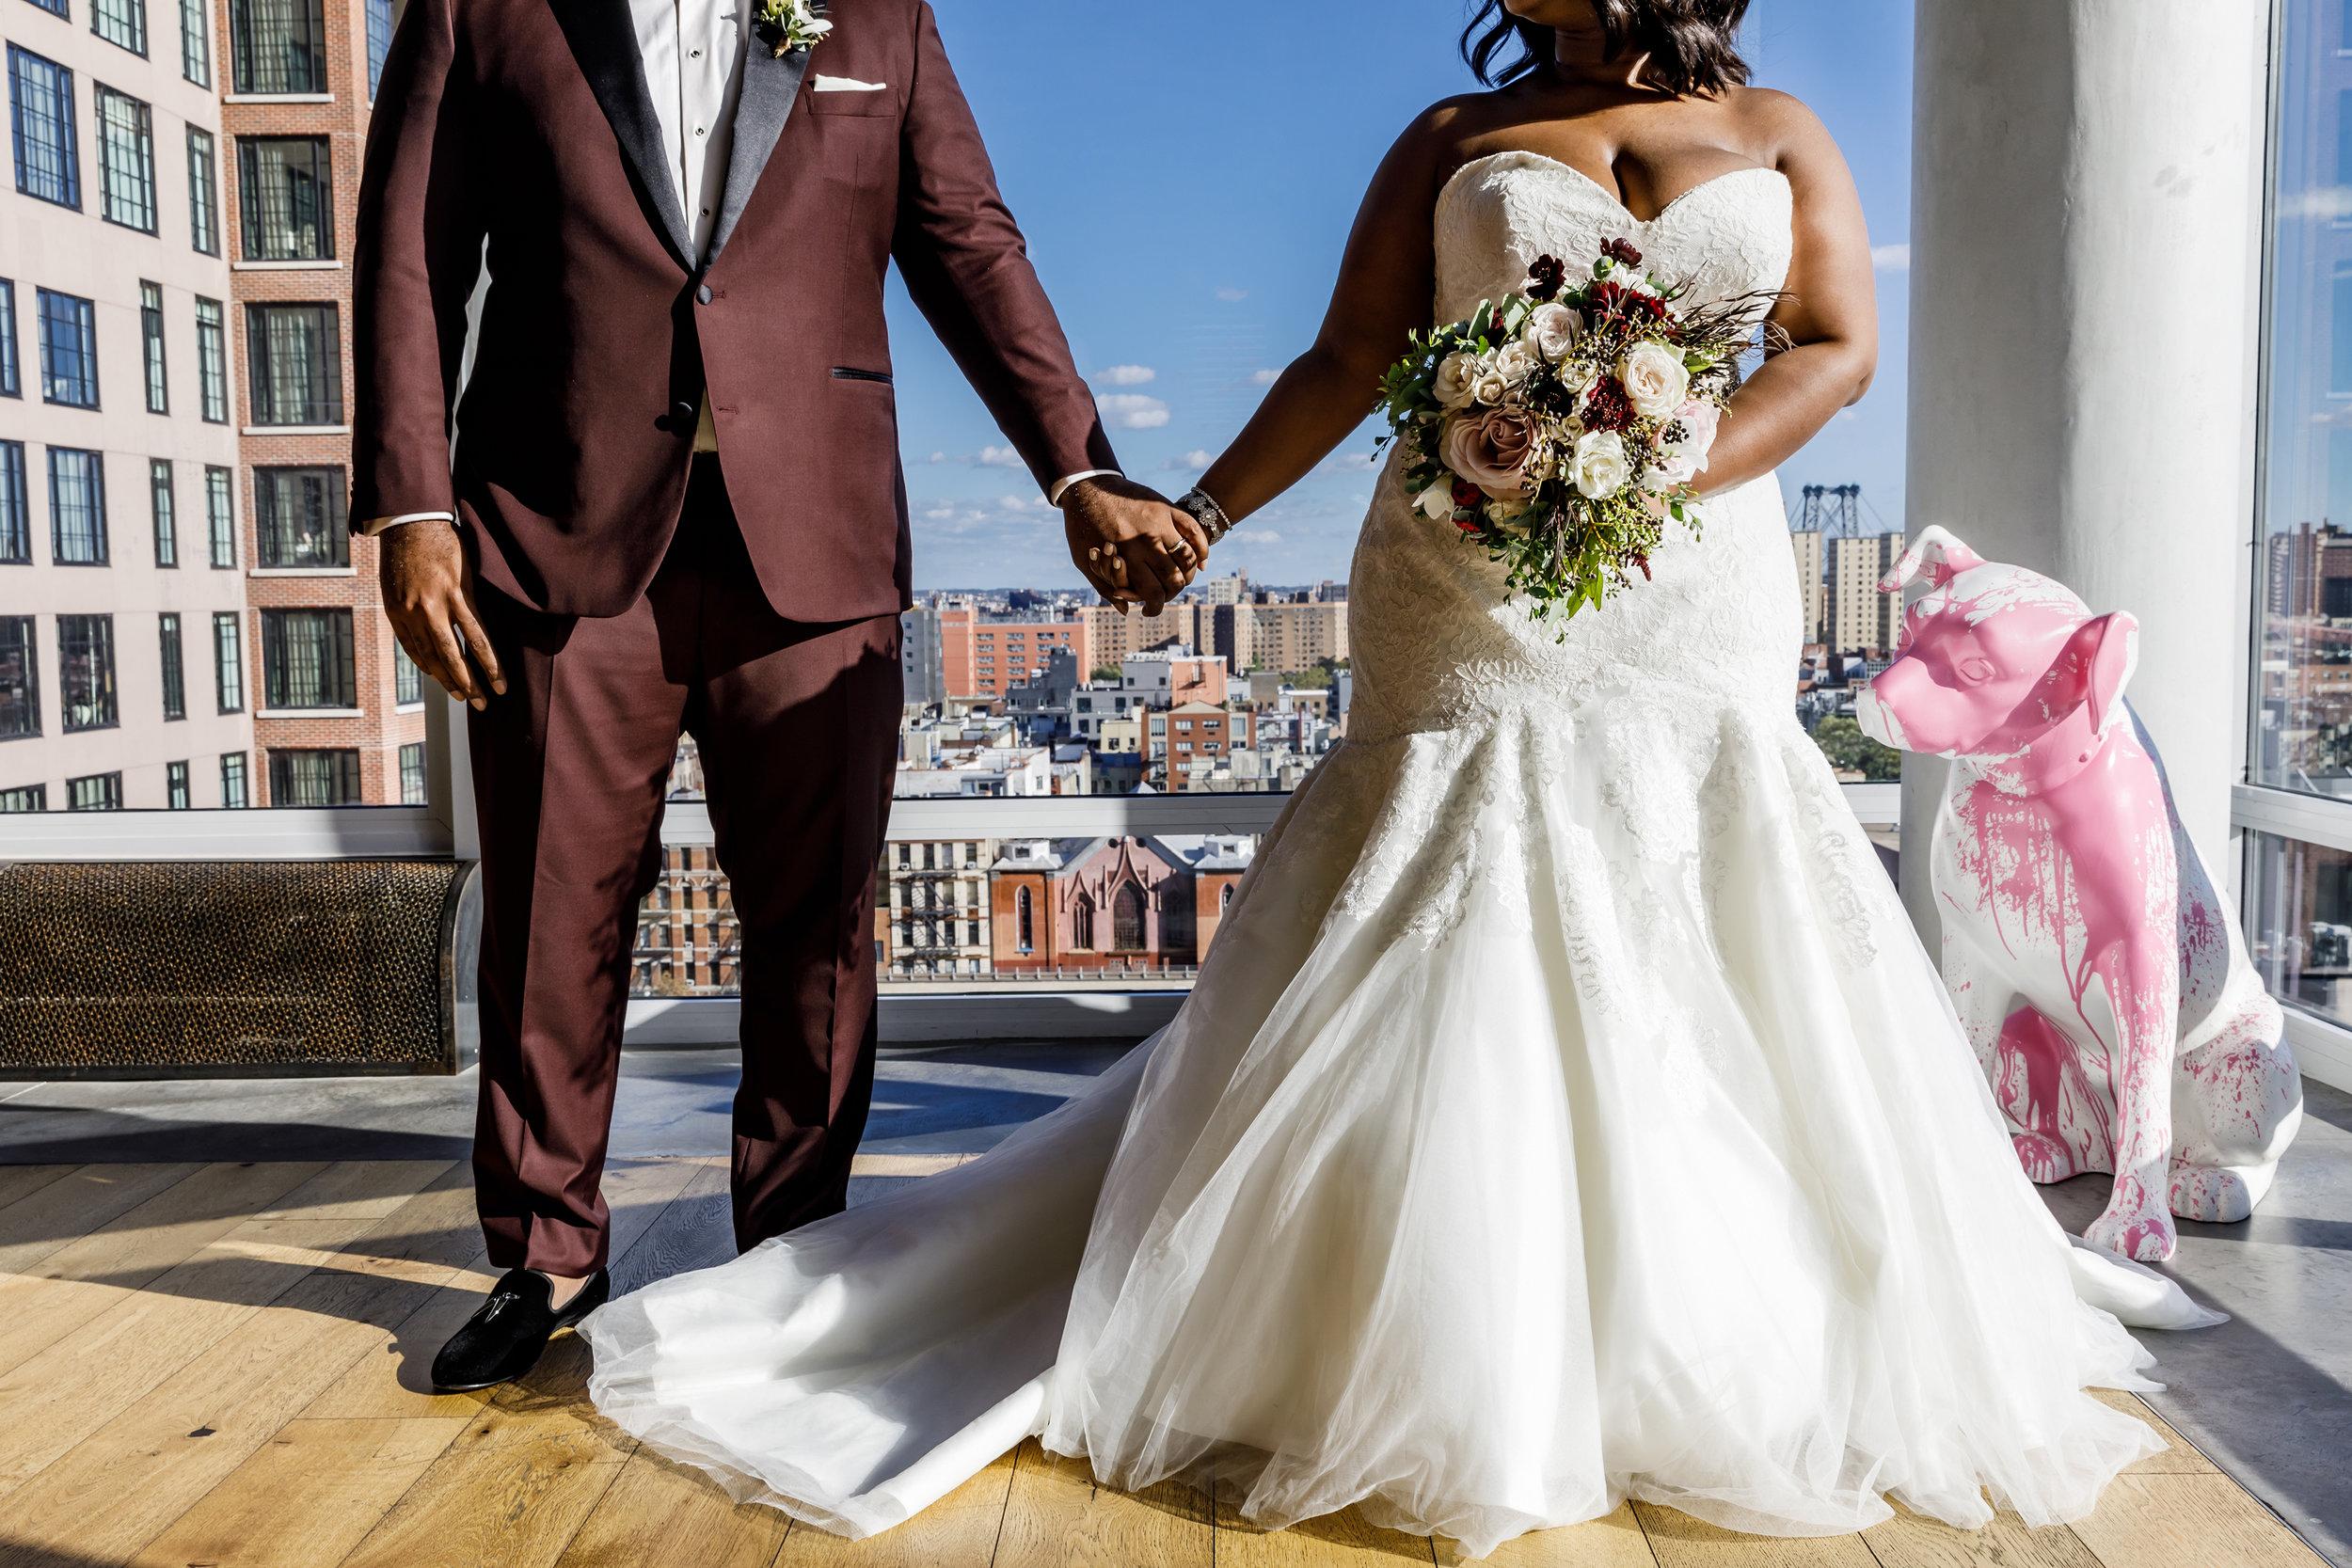 victorious-events-nyc-026-yanique-rondel-greenpoint-loft-wedding-amy-anaiz.jpg